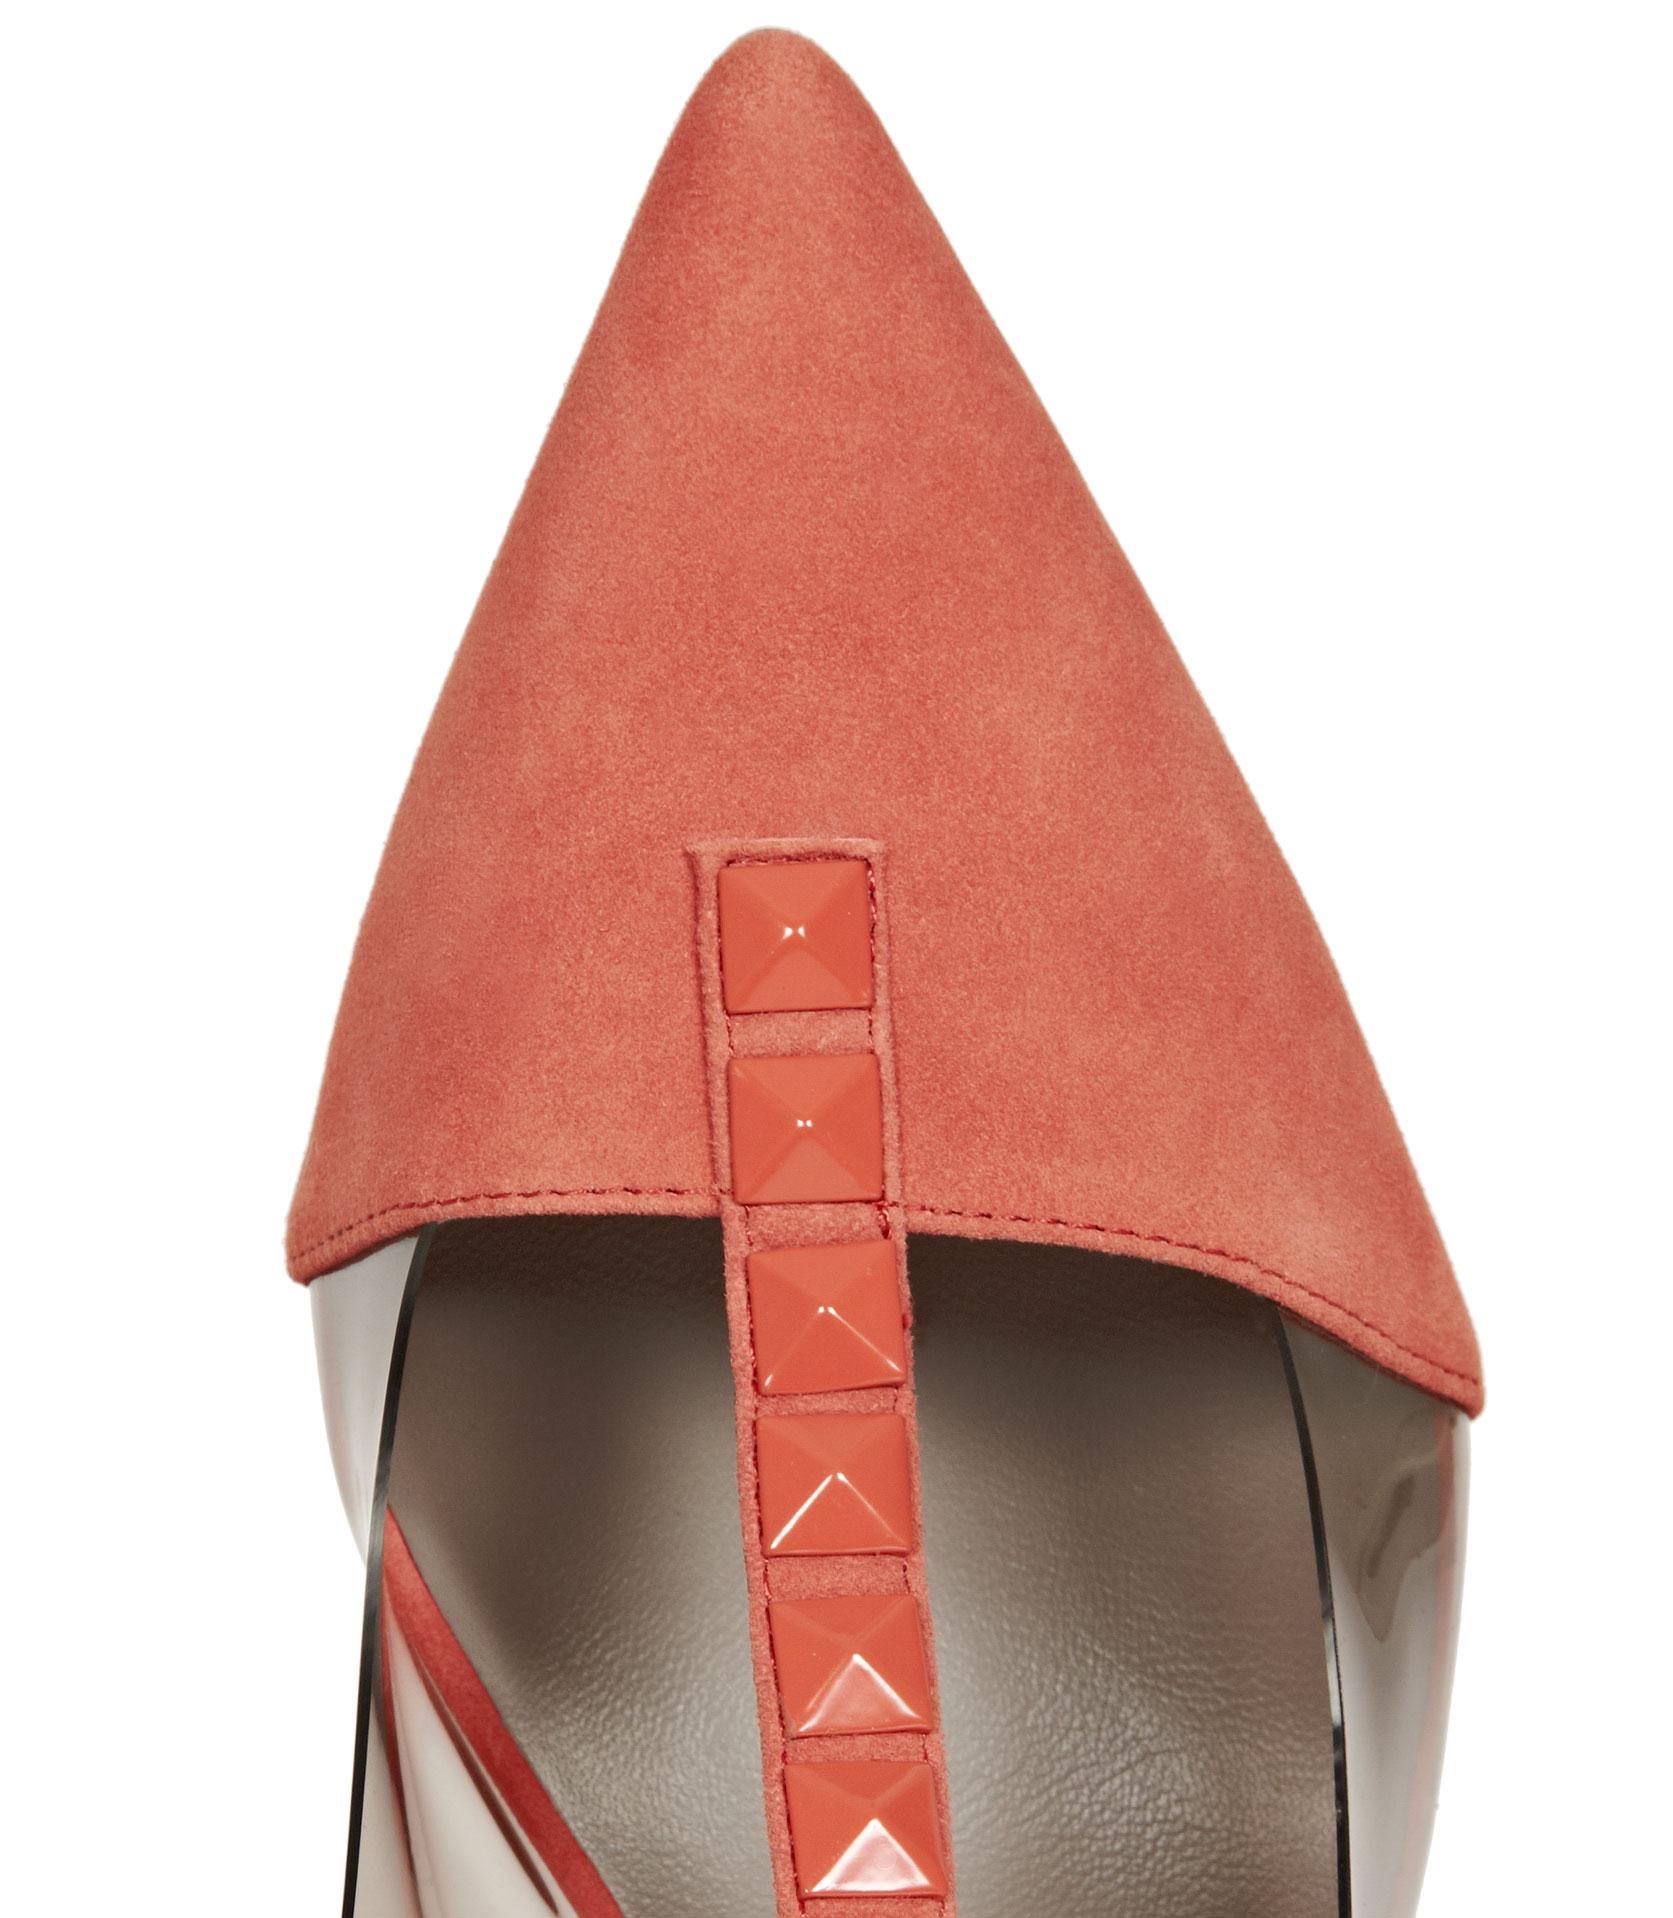 f9931c46c4d Lyst - Reiss Henriette Pyramid Stud Kitten Heel Slingbacks in Pink